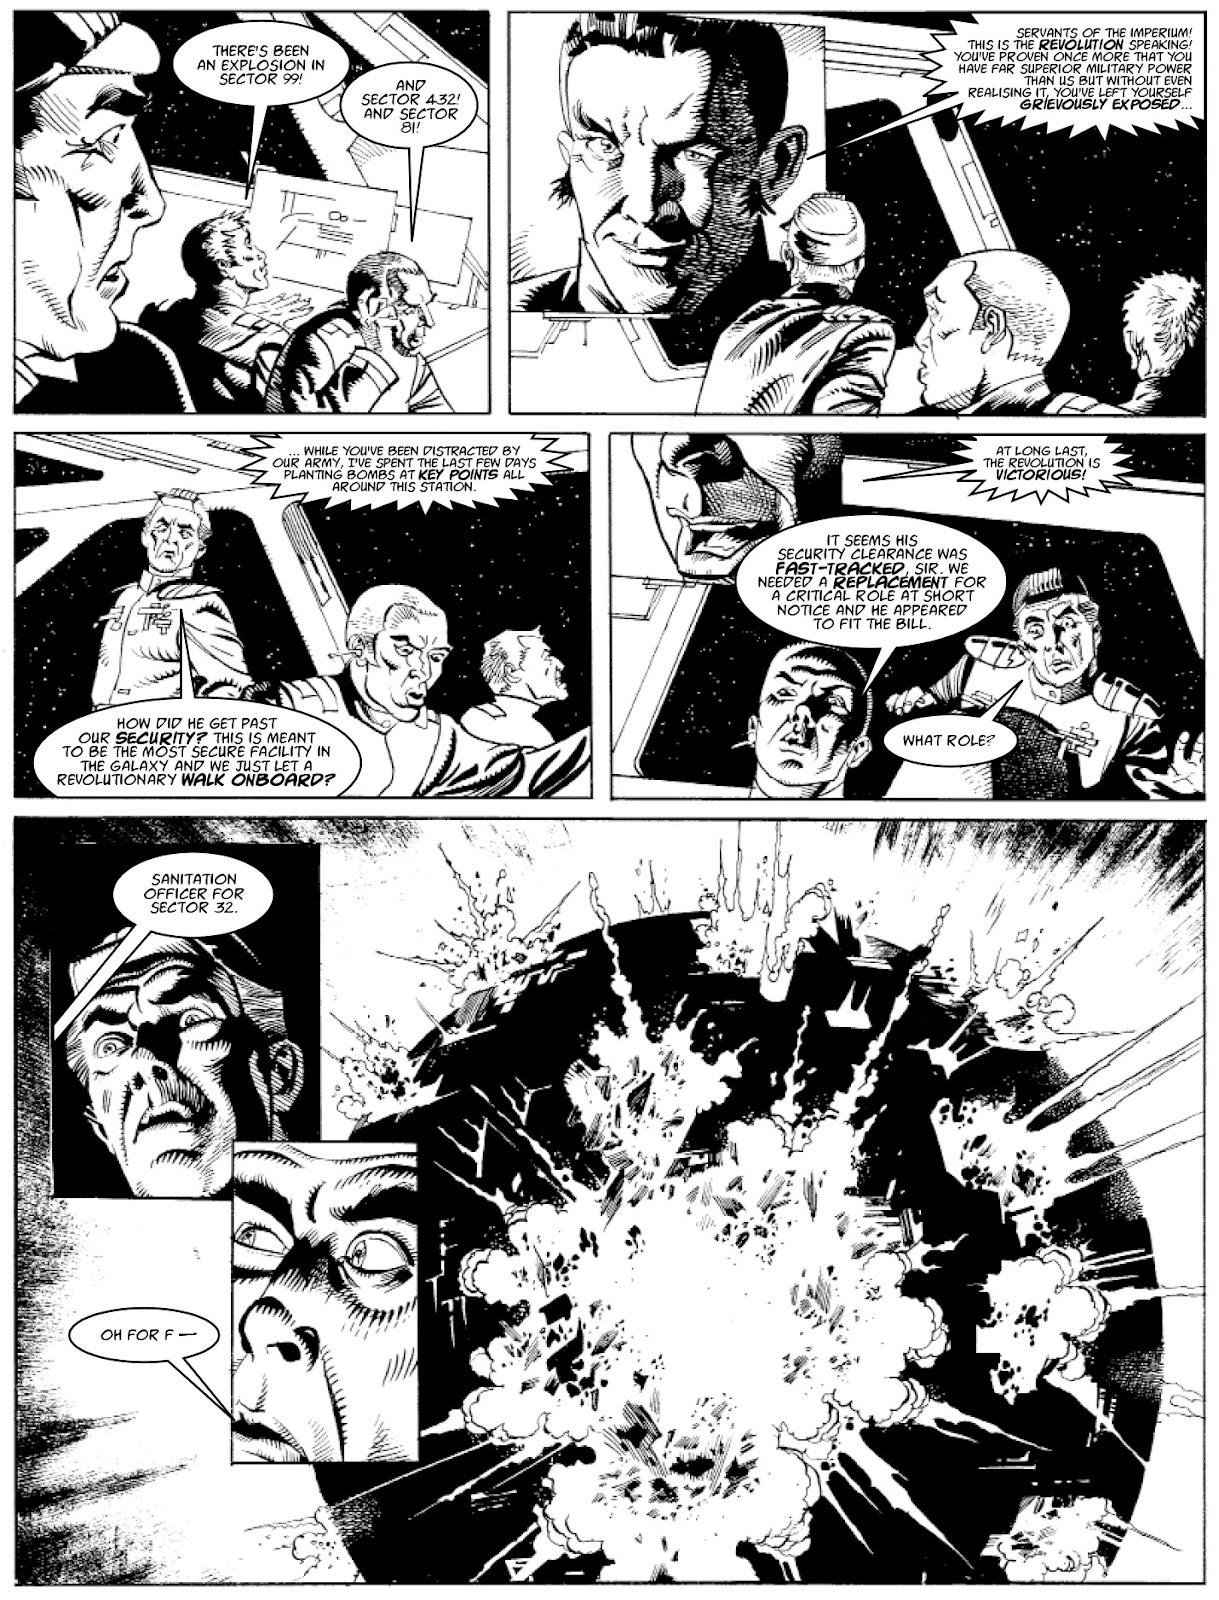 Judge Dredd Megazine (Vol. 5) issue 427 - Page 118